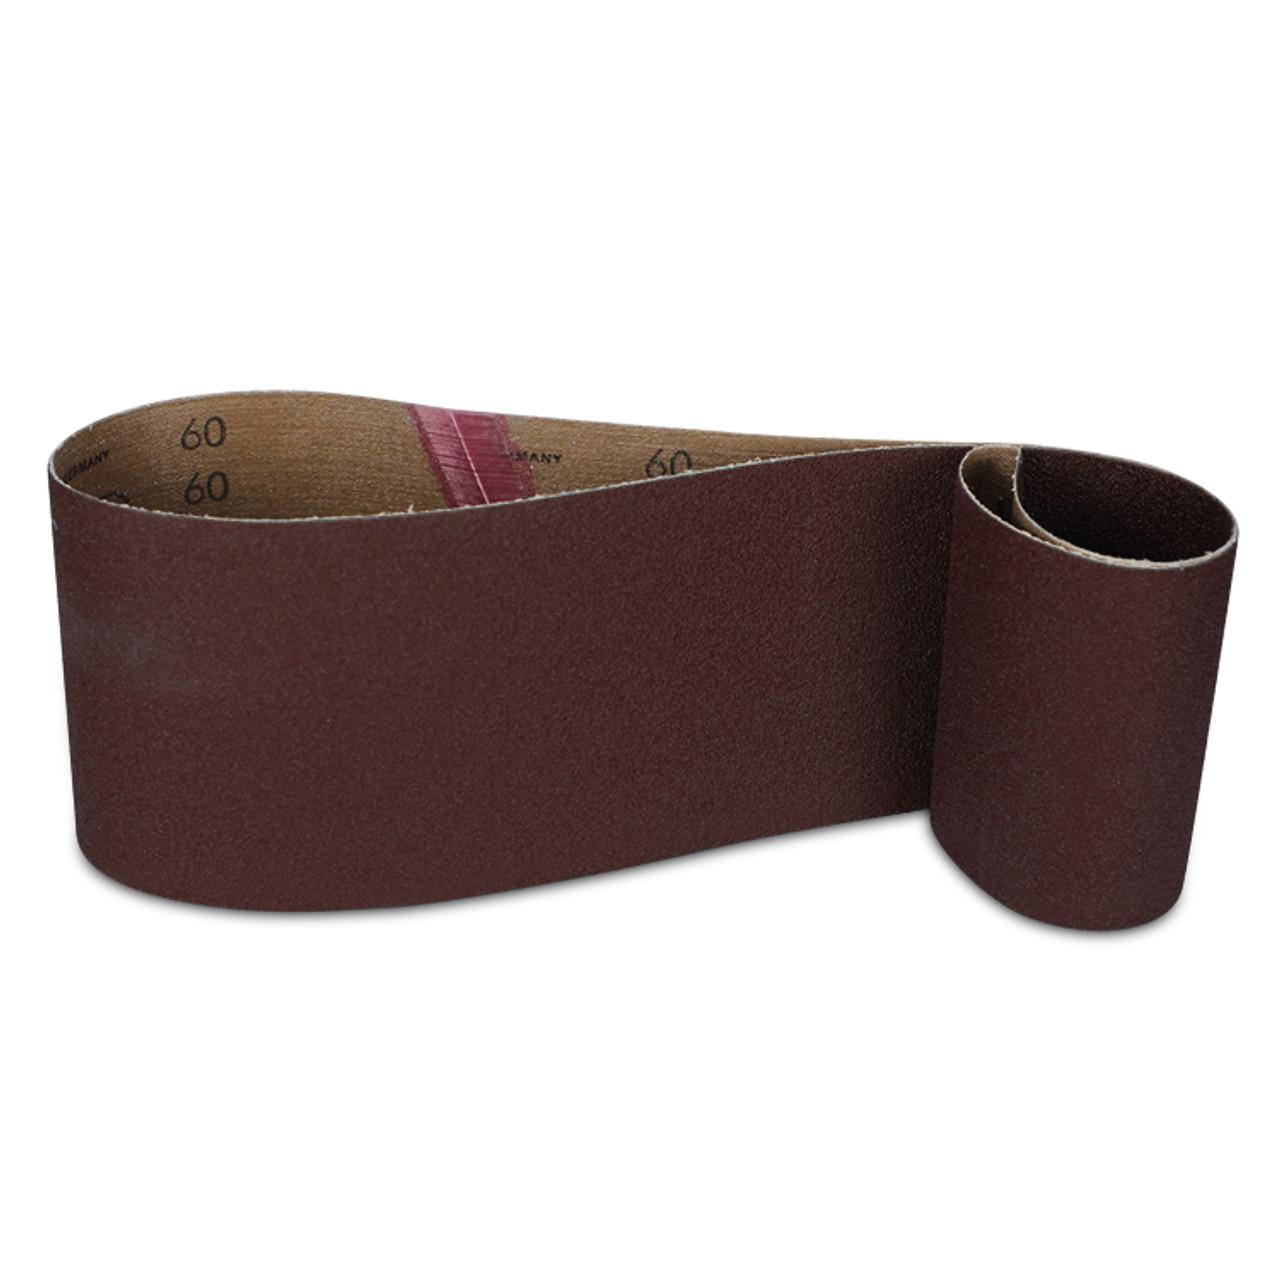 3 Pack 4 X 24 Inch 400 Grit Aluminum Oxide Metal Sanding Belts